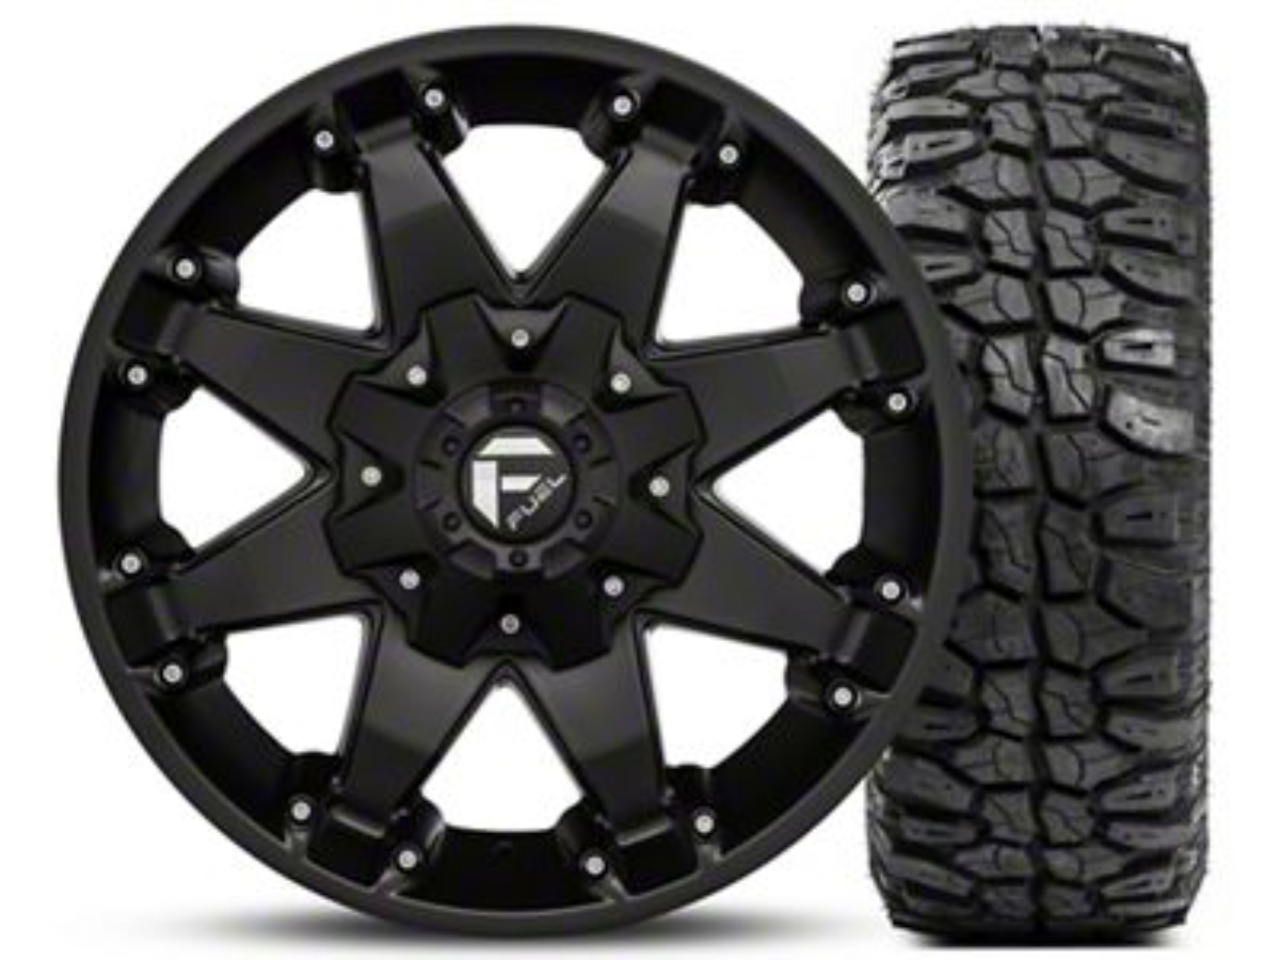 Fuel Wheels Octane Matte Black 17x8.5 and Mudclaw M/T LT265/70R17 Kit (07-18 Jeep Wrangler JK; 2018 Jeep Wrangler JL)